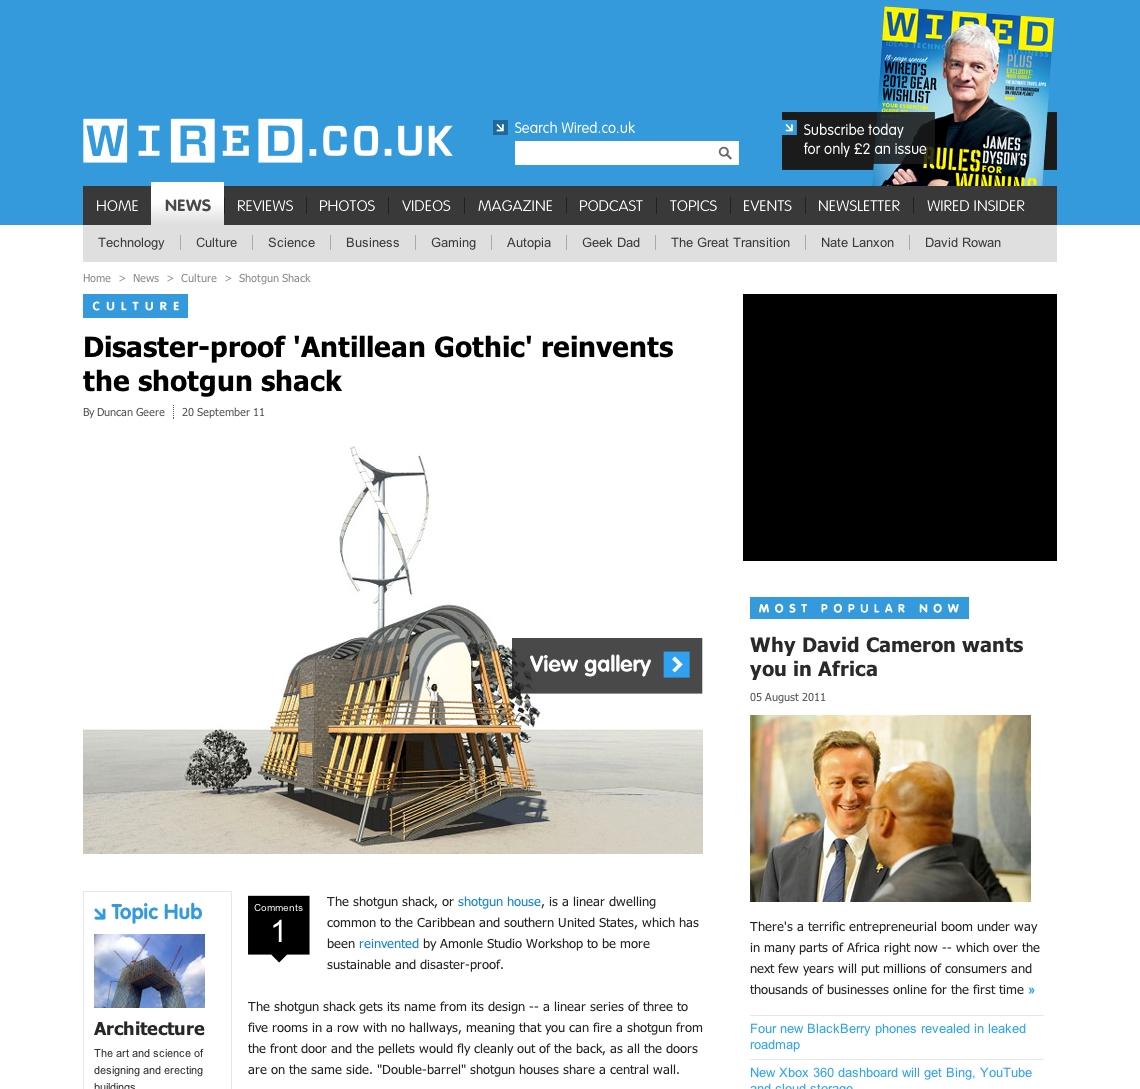 Antillean Gothic in the News